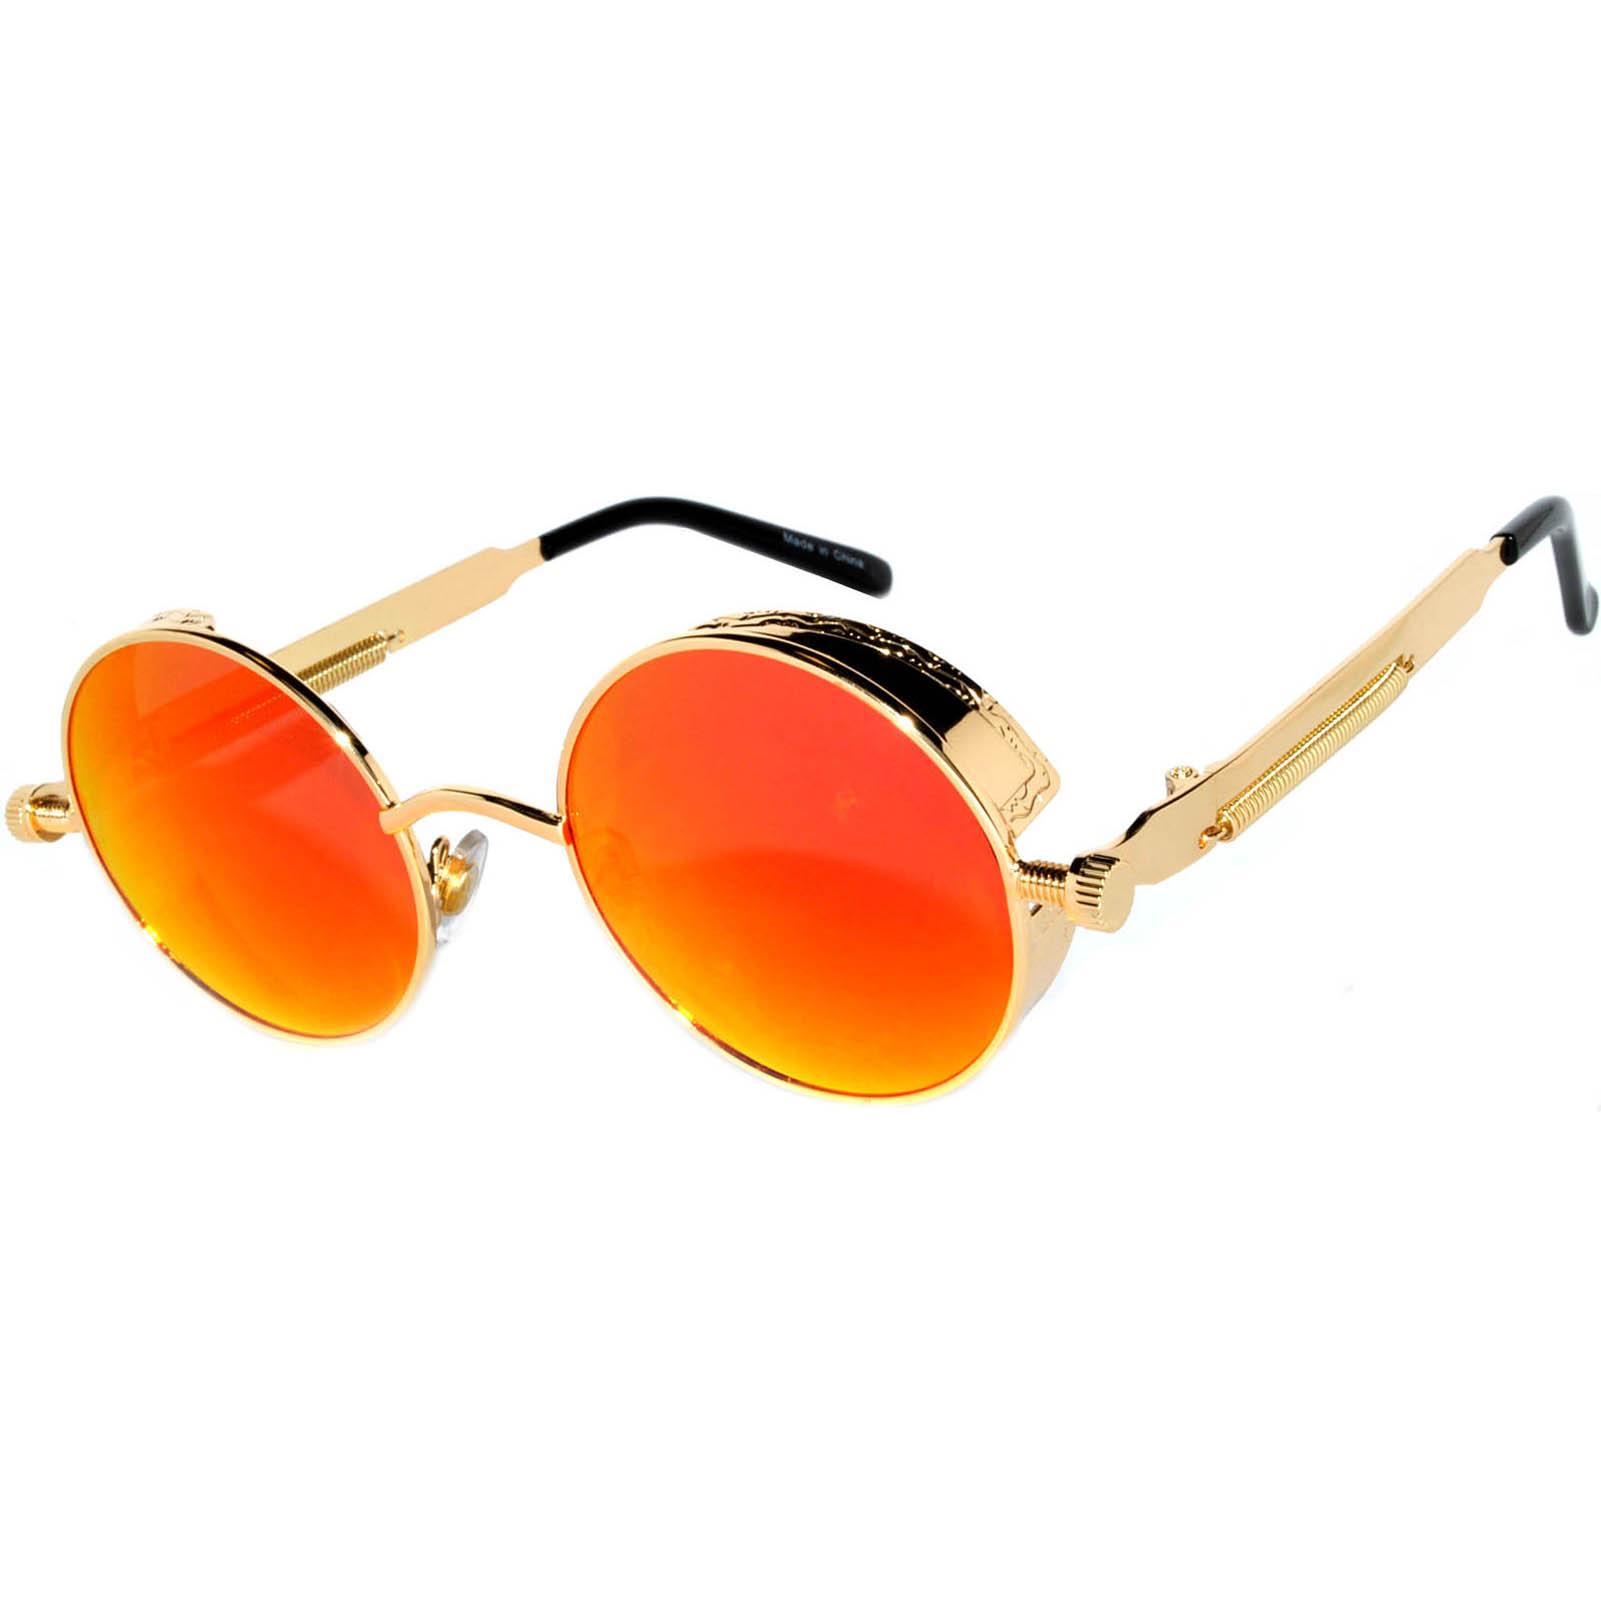 060 C14 Steampunk Gothic Sunglasses Metal Round Circle Gold Frame ...